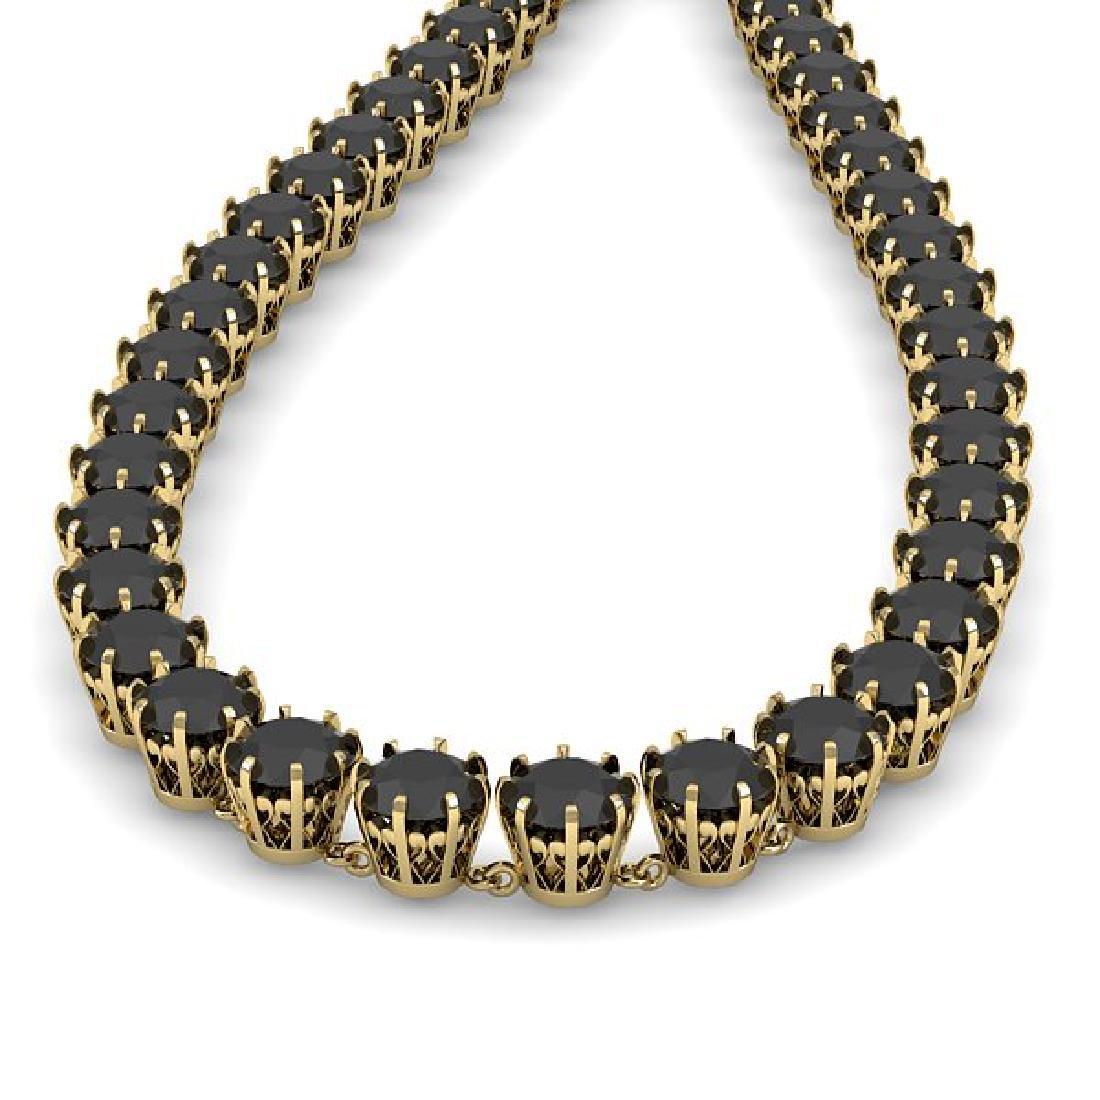 54 CTW Certified Black VS Diamond Necklace 14K Yellow - 2